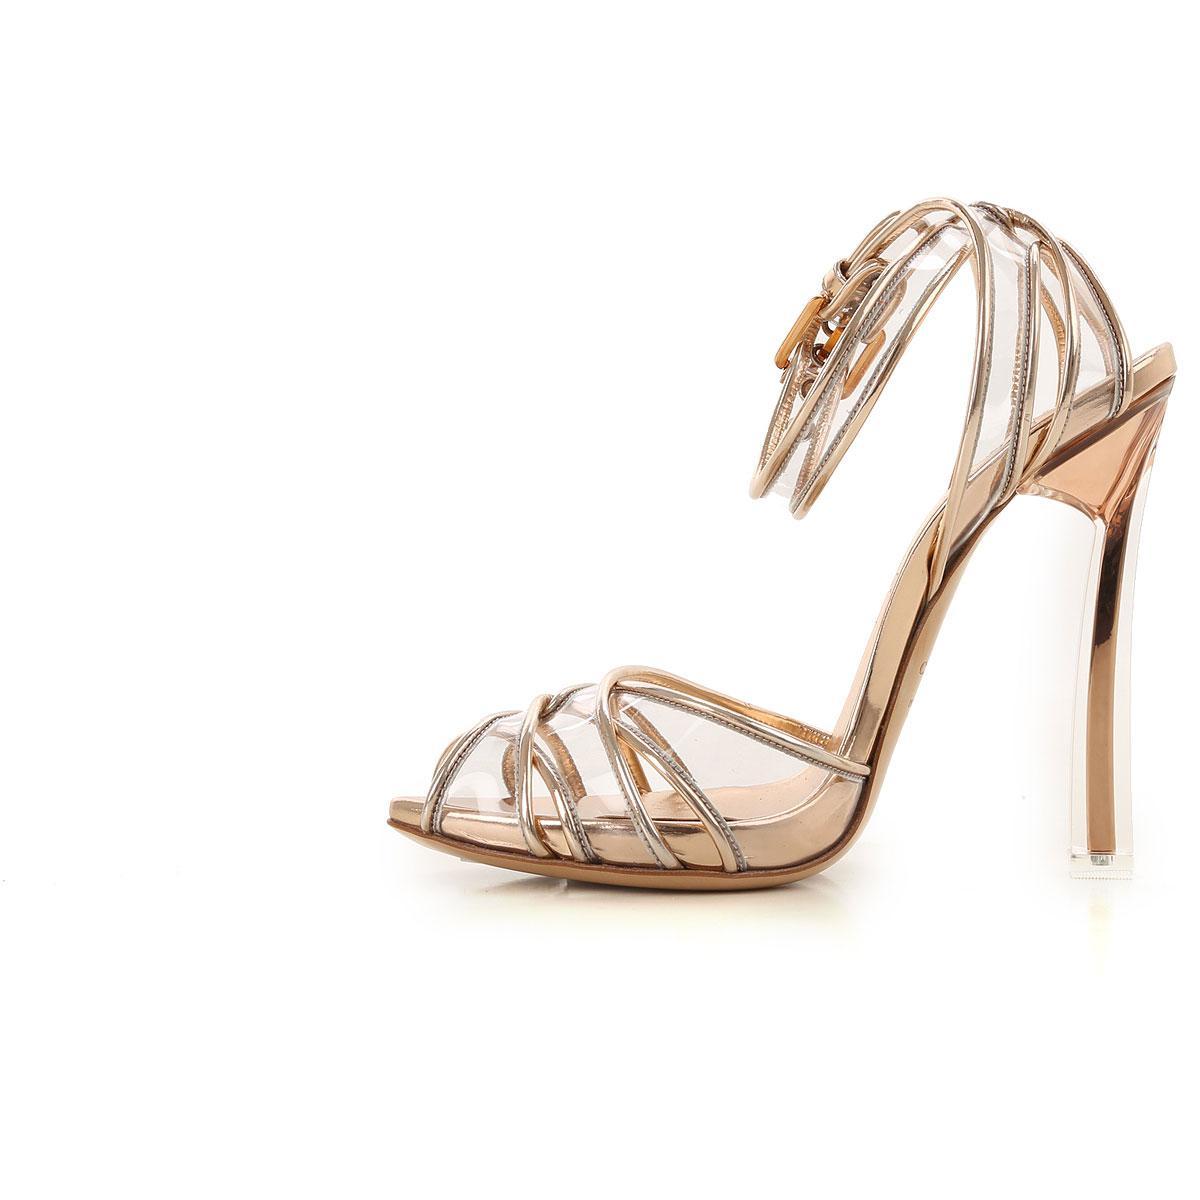 d5d96b158f7 Casadei - Metallic Sandals For Women On Sale In Outlet - Lyst. View  fullscreen